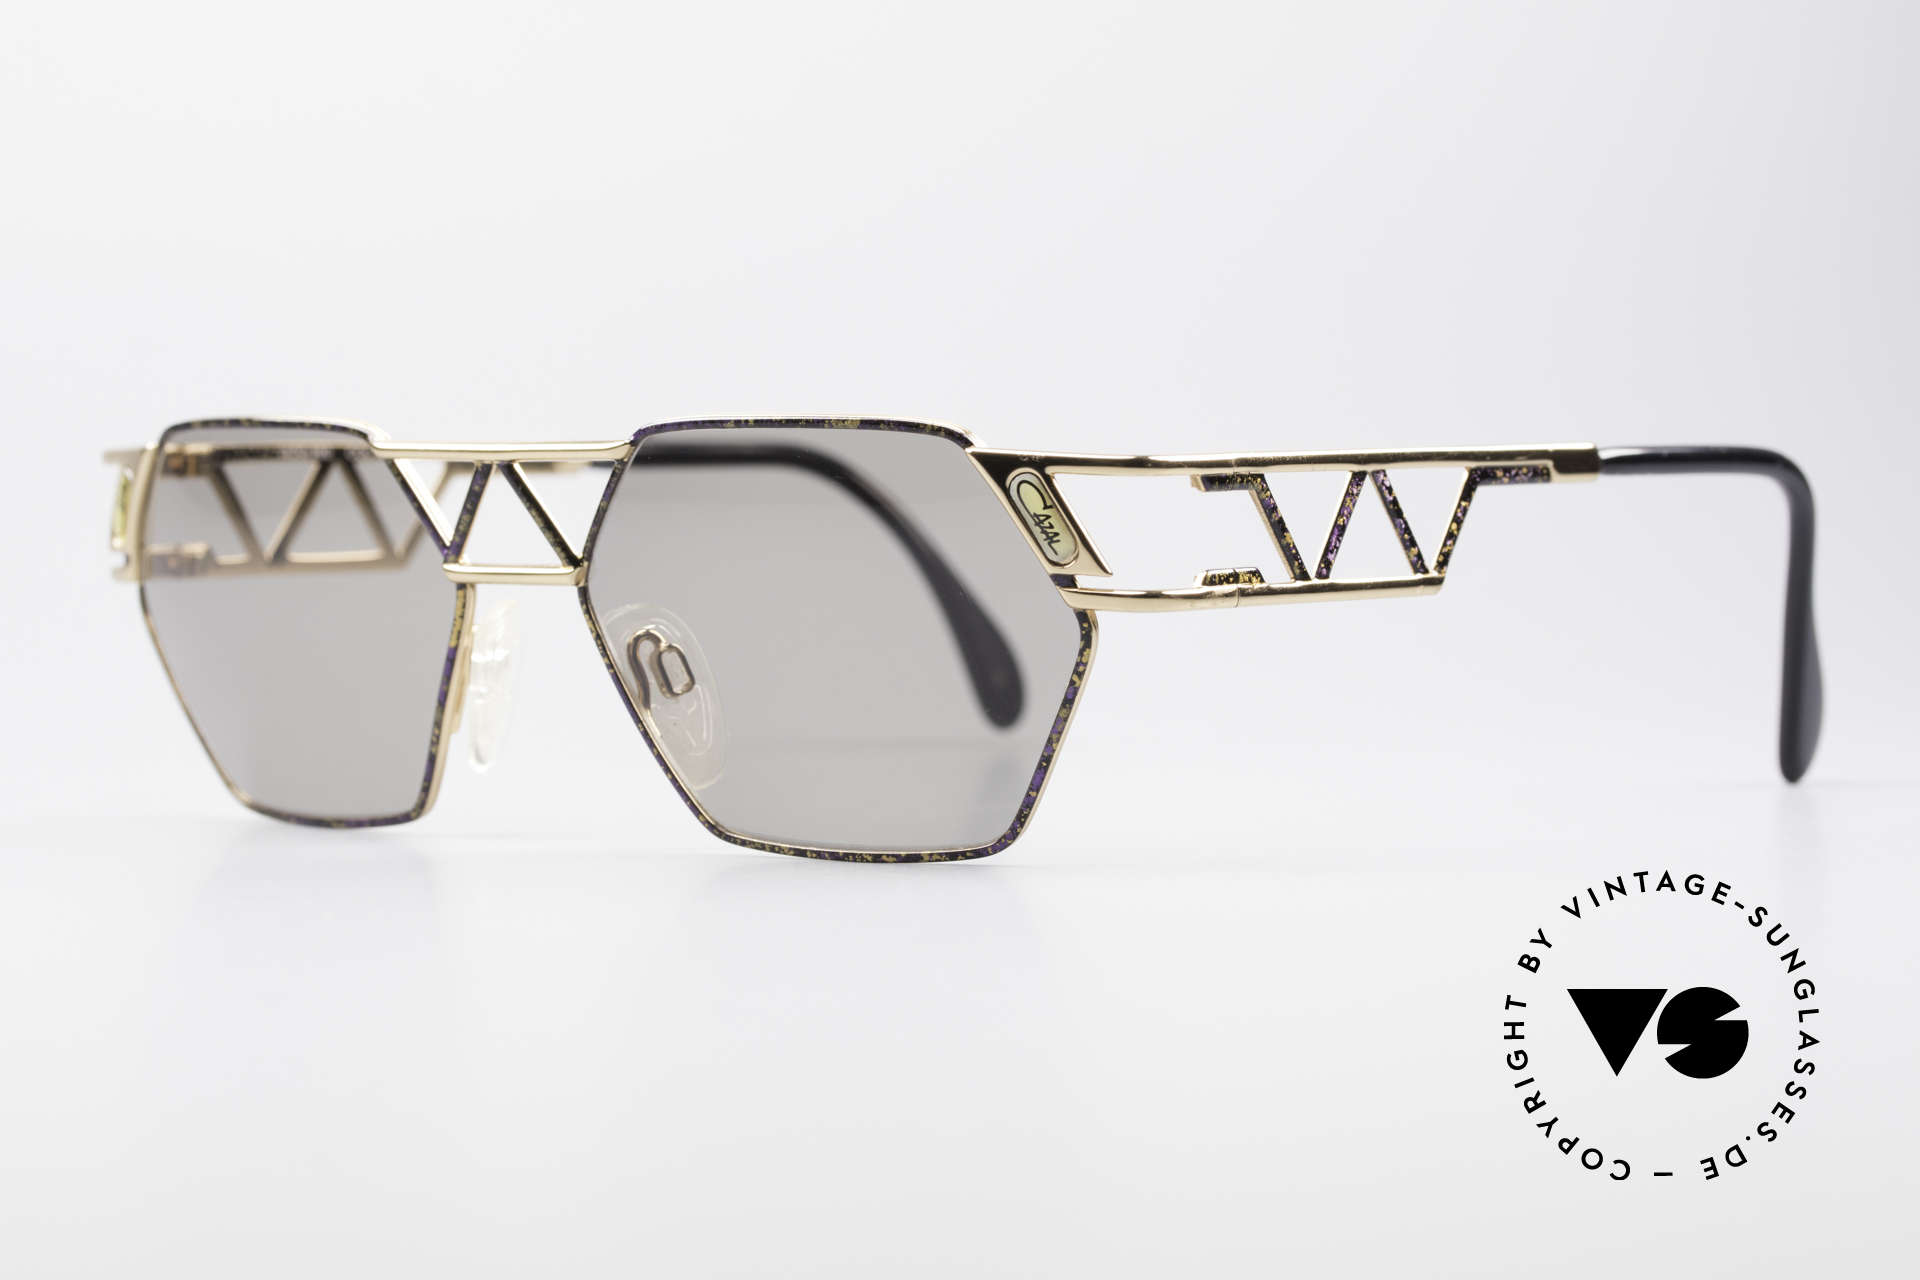 Cazal 960 Unique Designer Sunglasses, noble & interesting coloring / pattern (purple mottled), Made for Men and Women